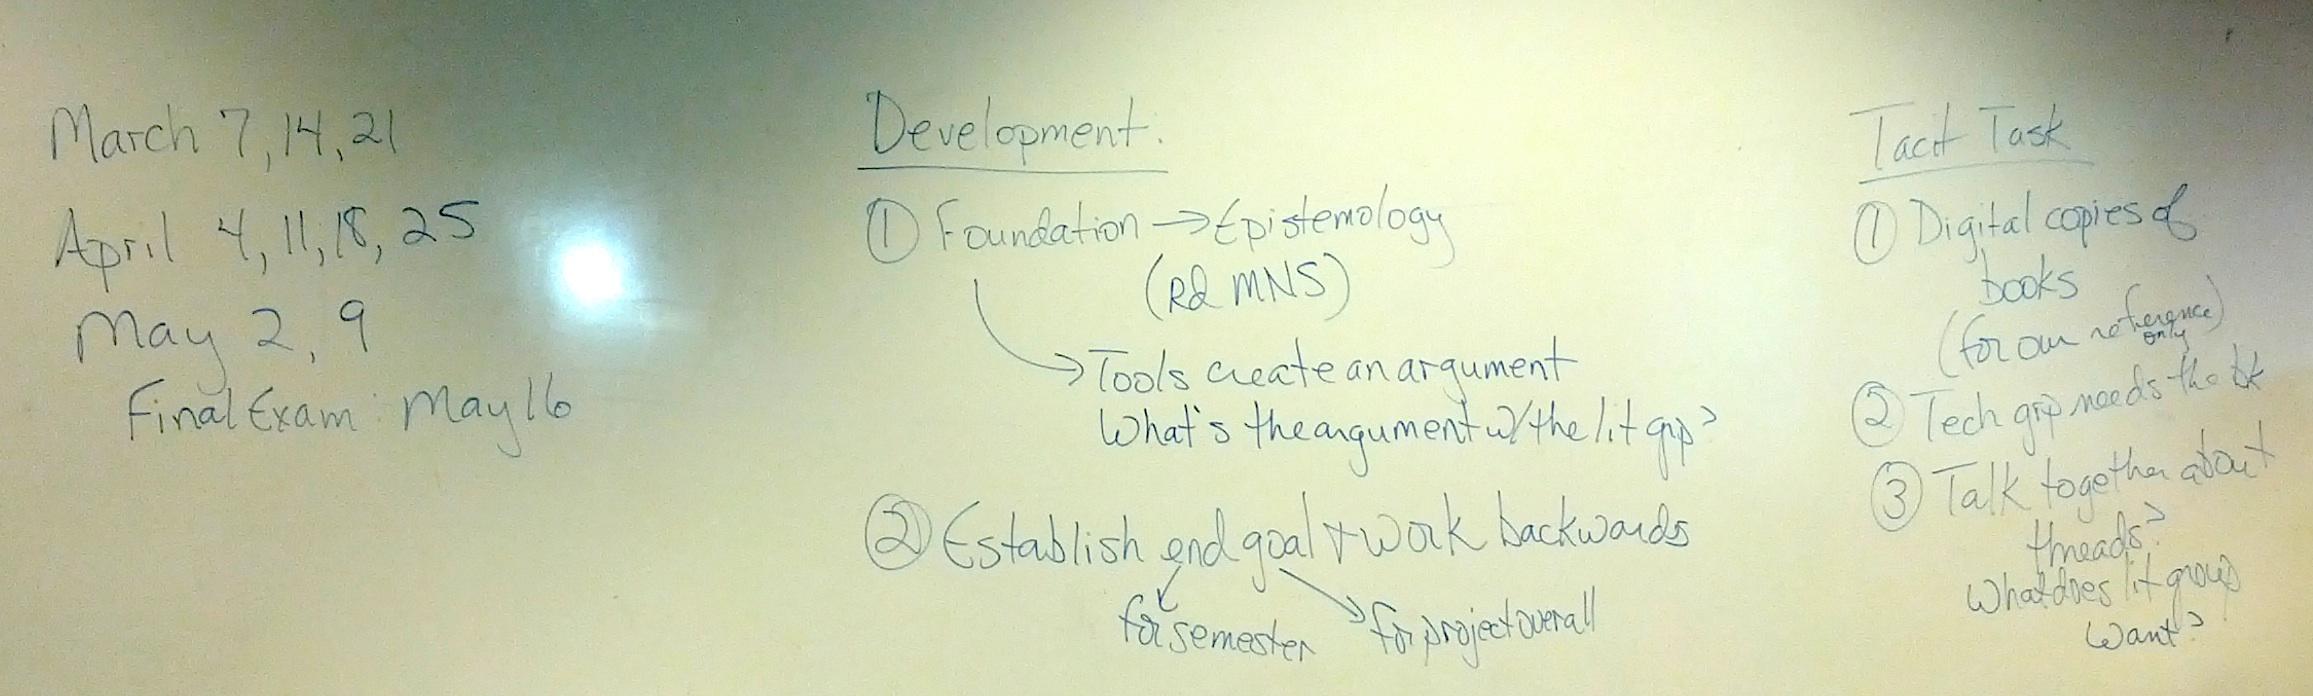 BeardStair-Figure-7-loose-sketch-of-development-phase